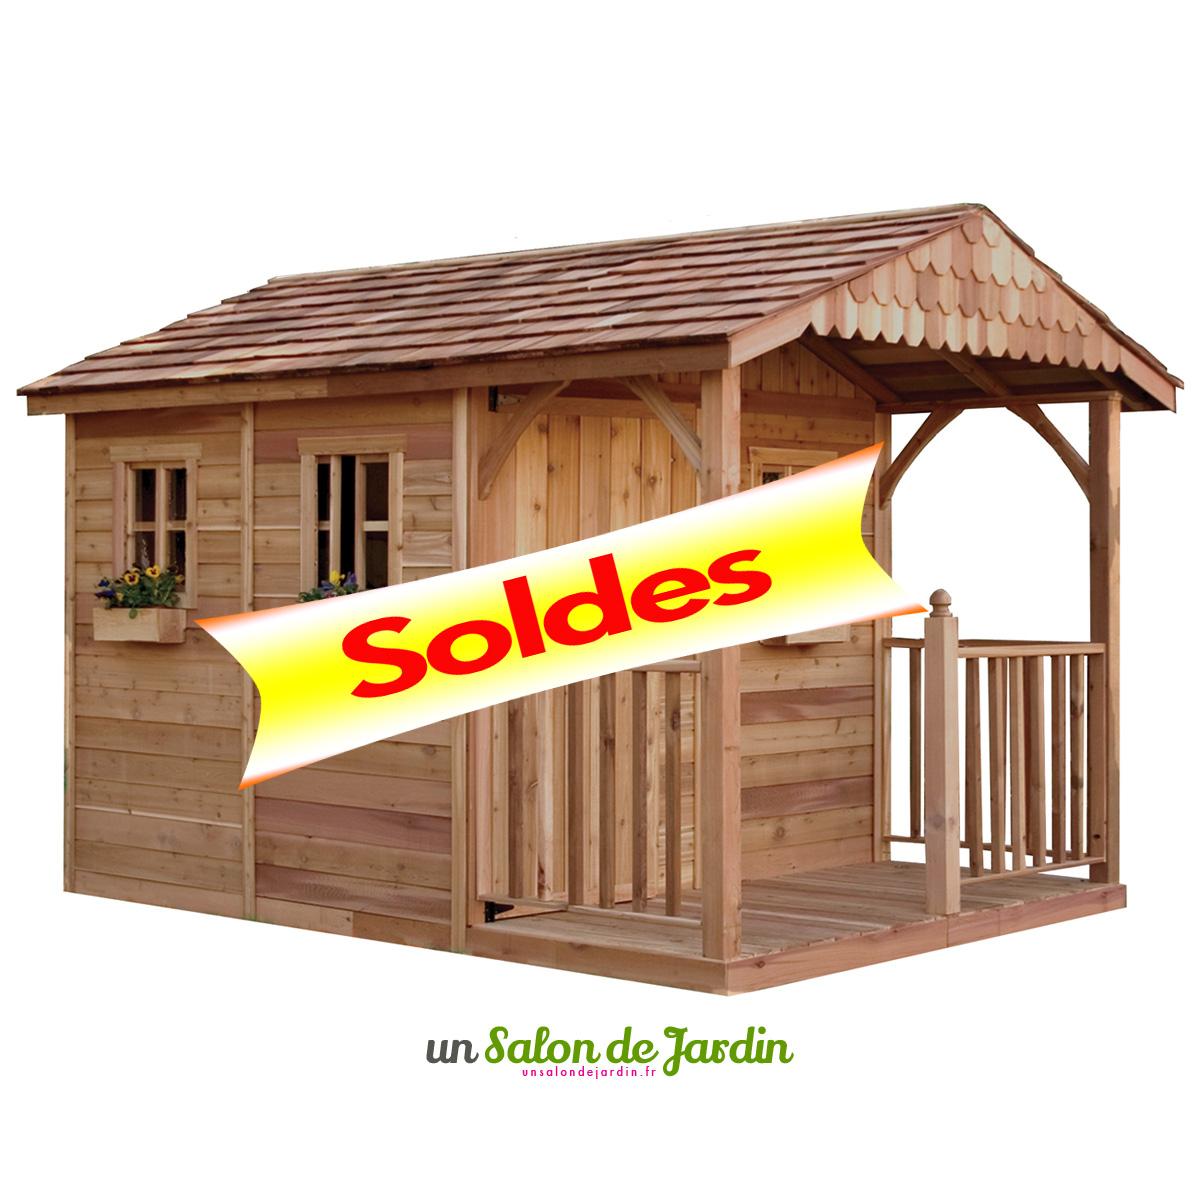 Code Promo 4Ce5C C1302 Chalet De Jardin Solde - Uscompiegne.fr concernant Abri De Jardin En Bois Carrefour